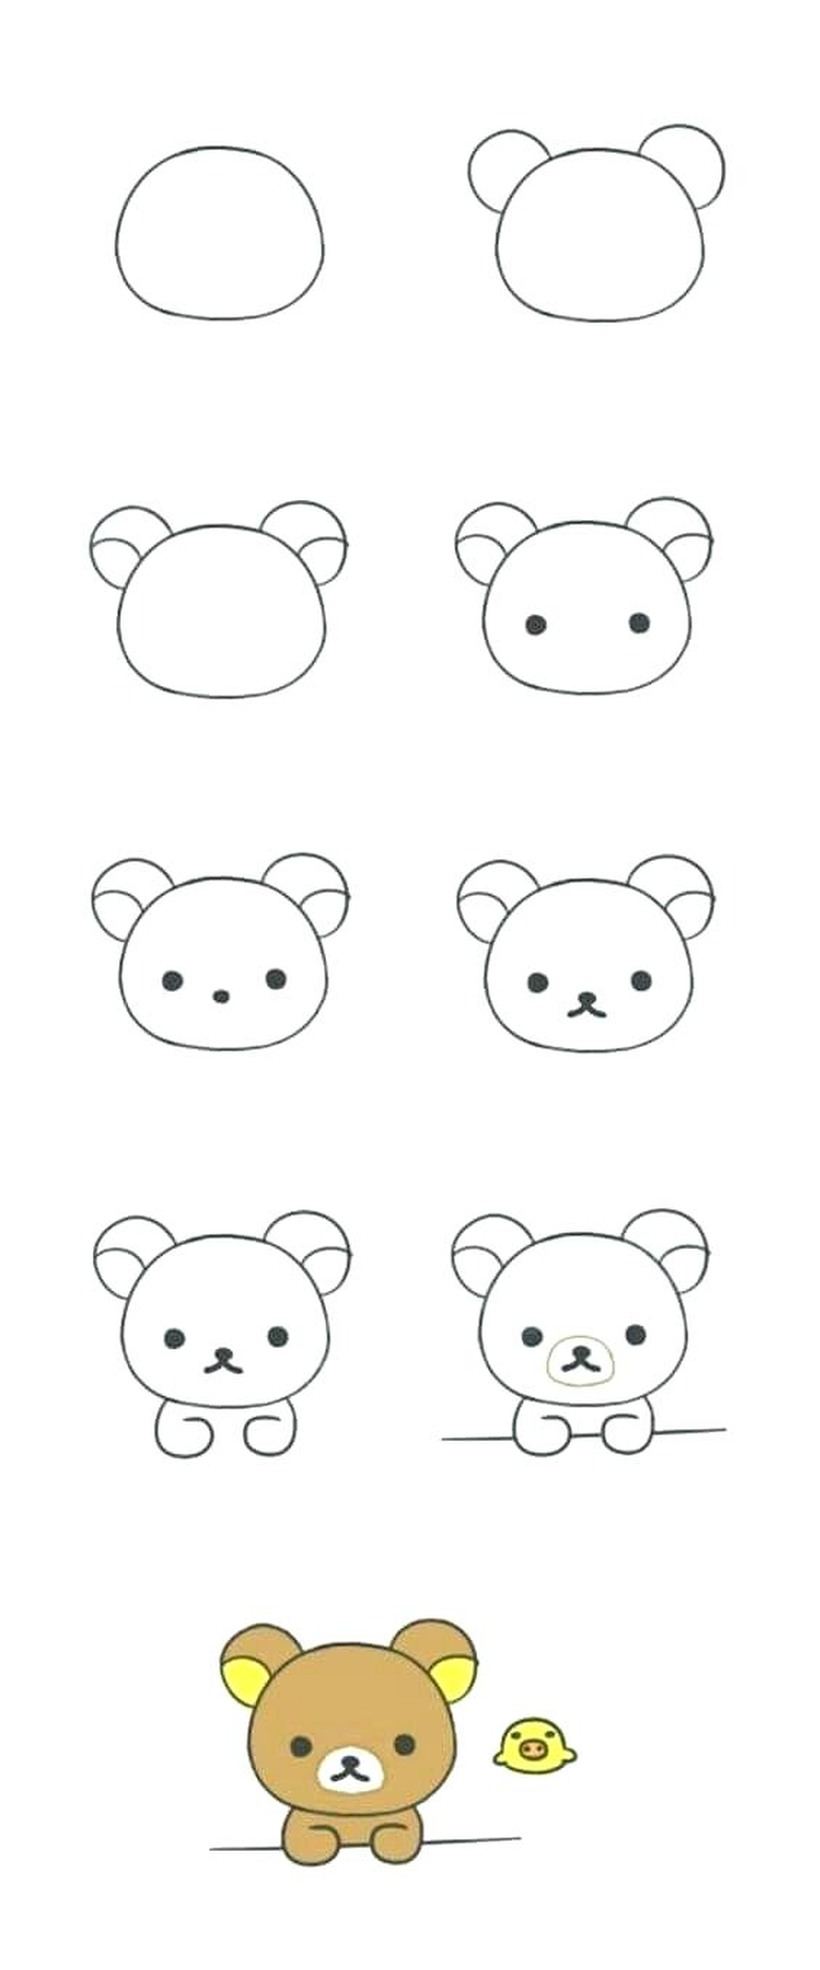 oso osos dibujos faciles ositos bonitos tiernos para hacer a lápiz y pintar